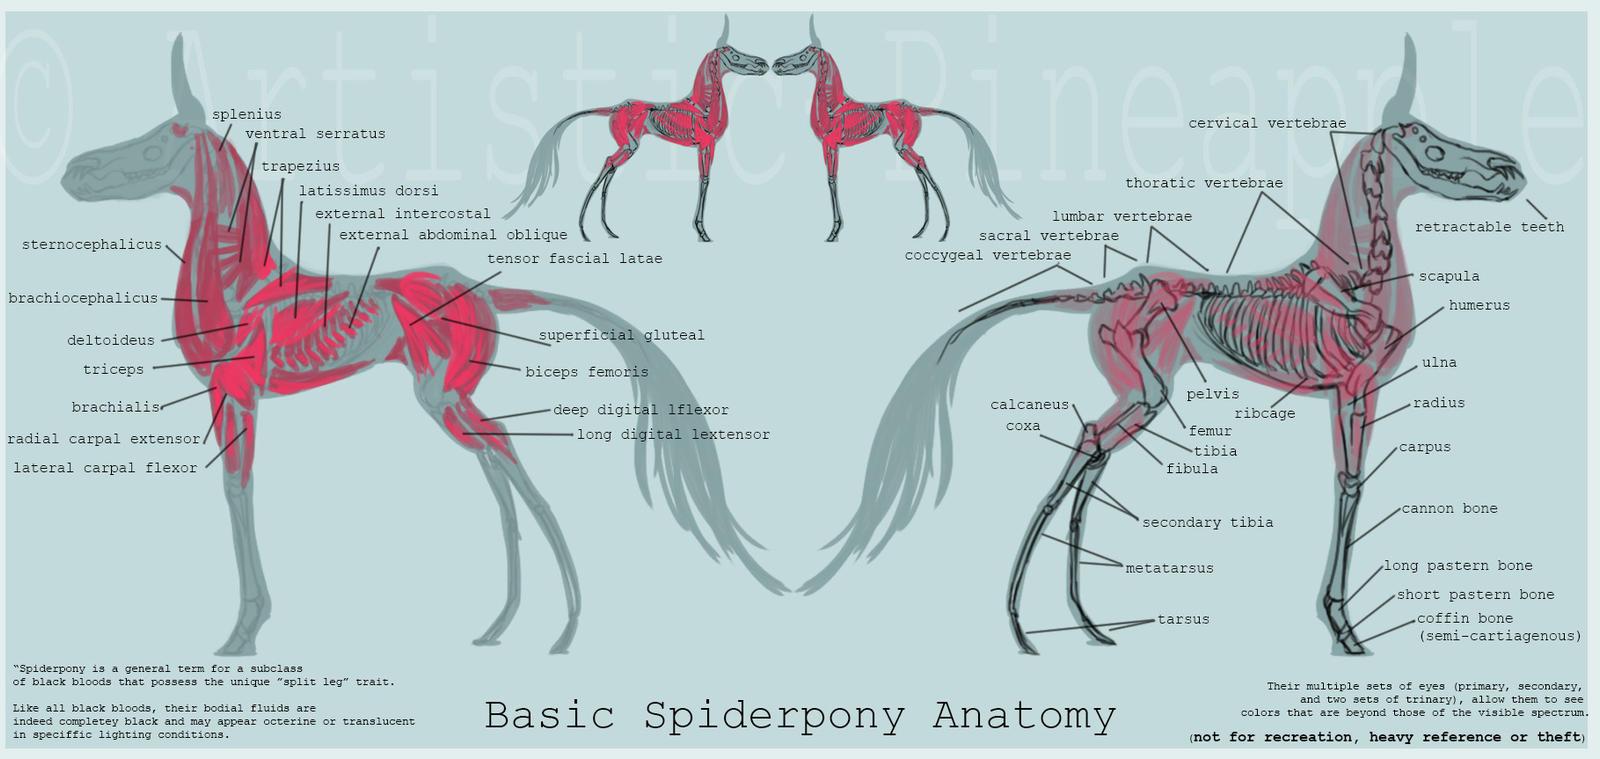 Basic Spiderpony Anatomy by Artistic-Pineapple on DeviantArt